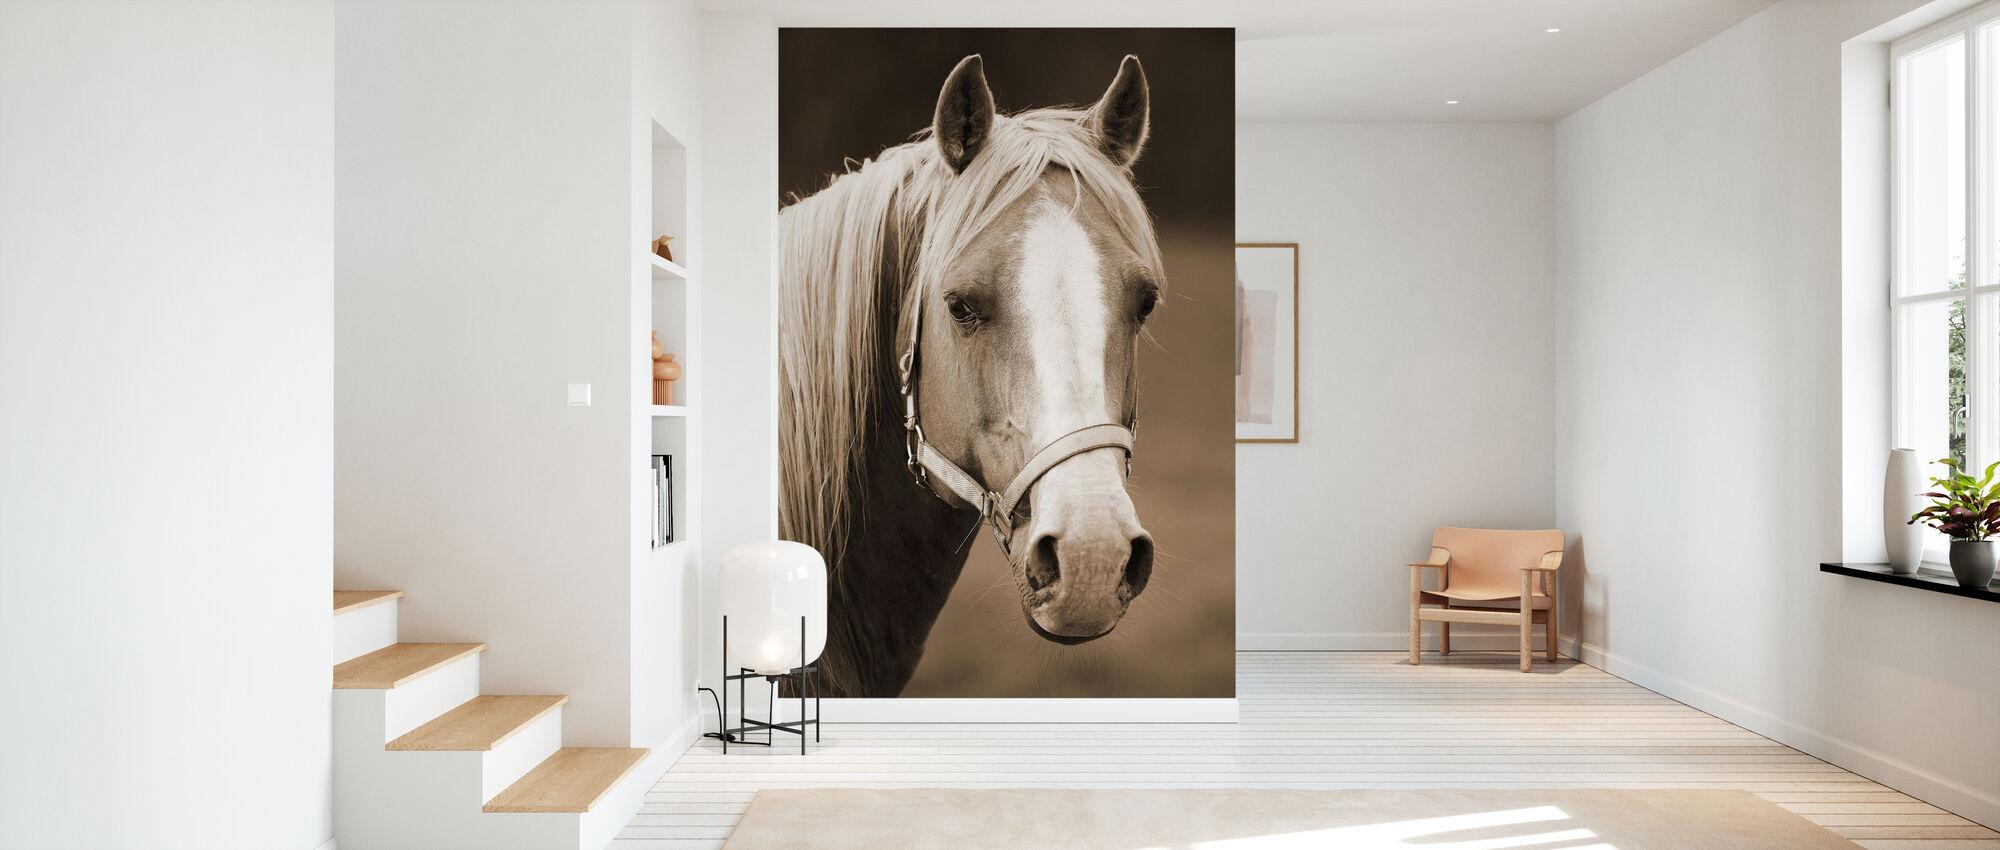 Horse - Wallpaper - Hallway